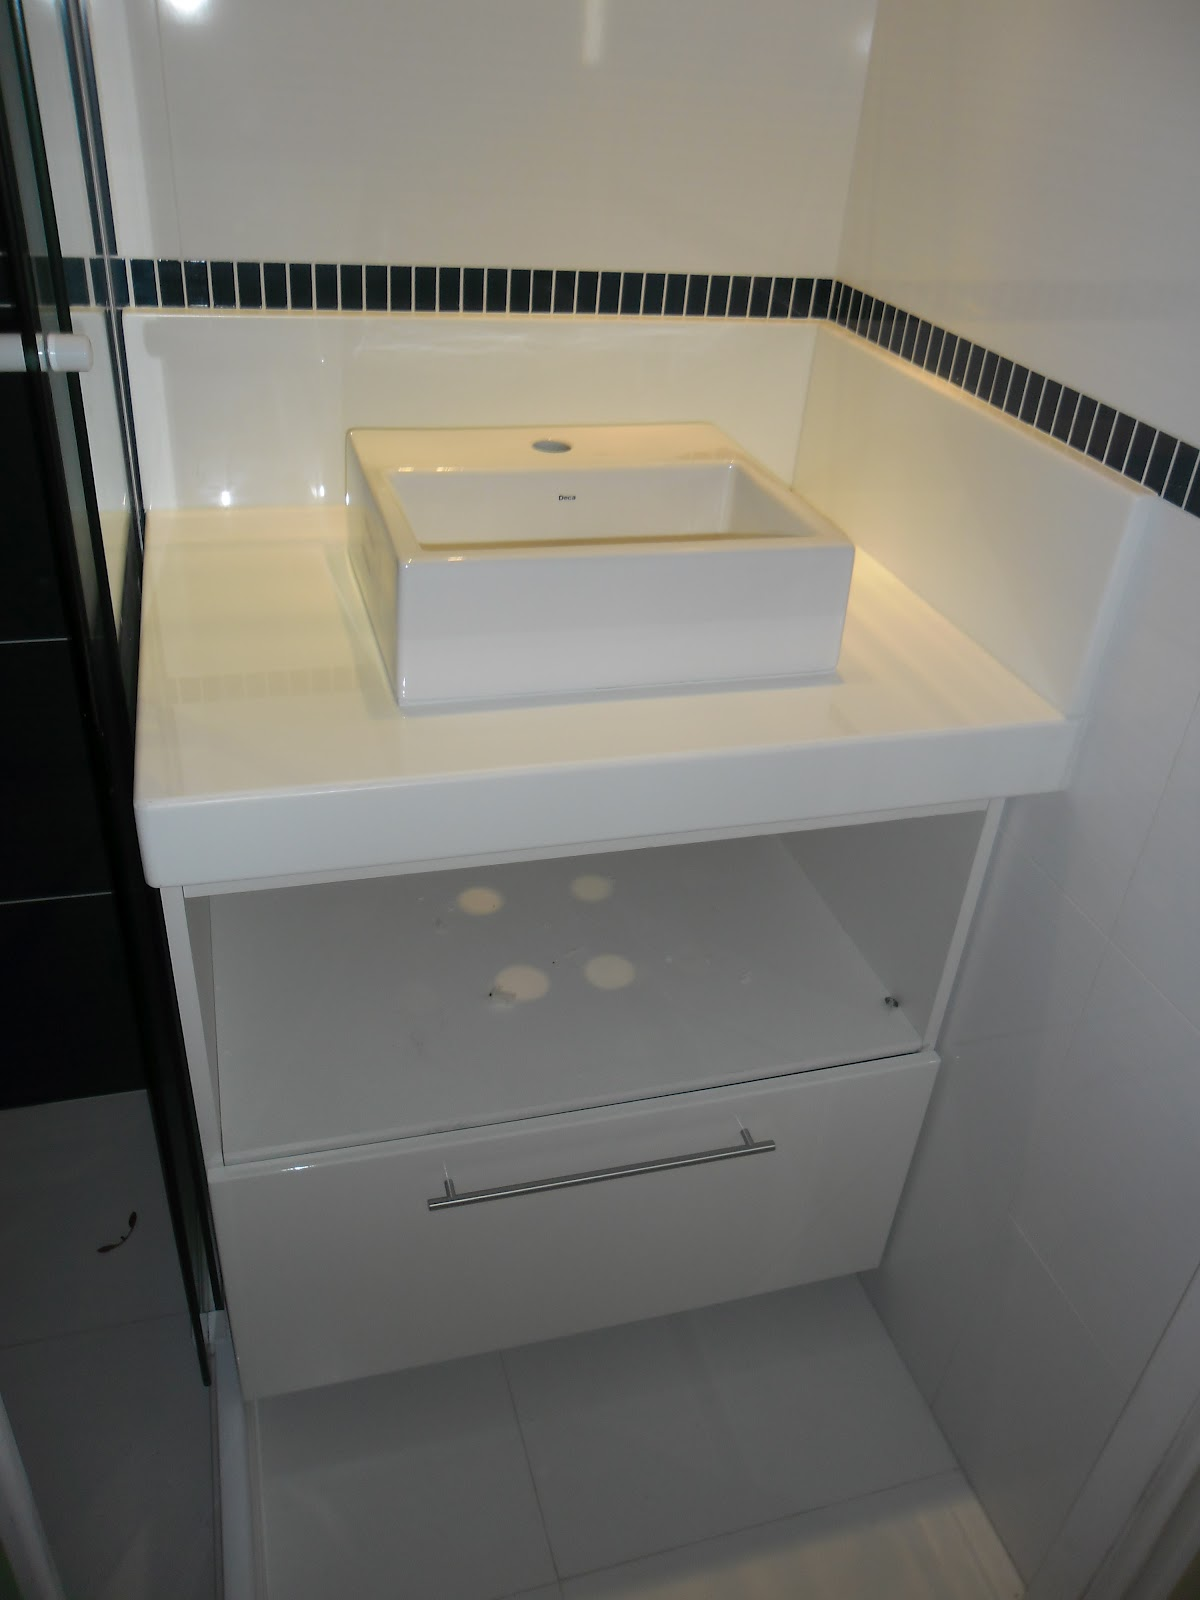 Pin Rmores Granitos Bancada Banheiro Granito Branco Siena Pelautscom  #7E6F4E 1200x1600 Bancada Banheiro Branco Siena